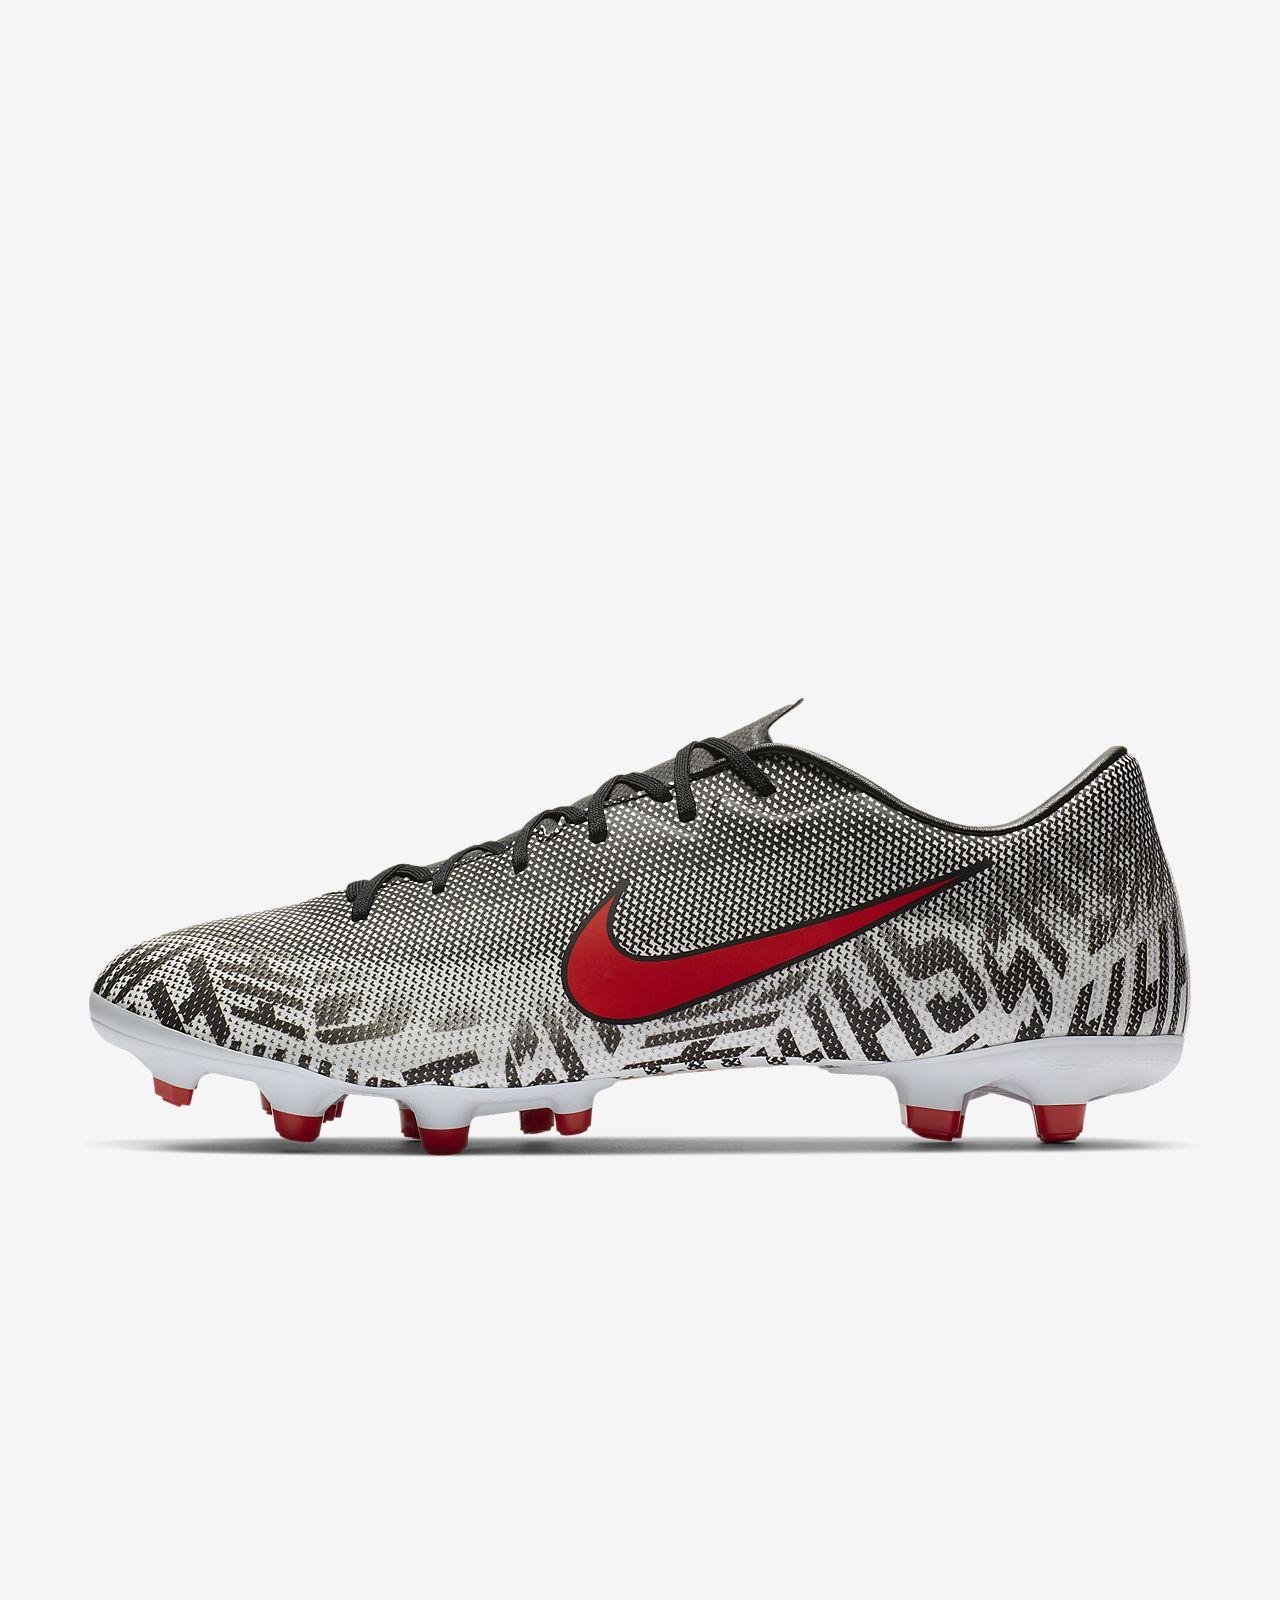 new concept 09b80 fab69 ... Nike Mercurial Vapor XII Academy Neymar Multi-Ground Football Boot